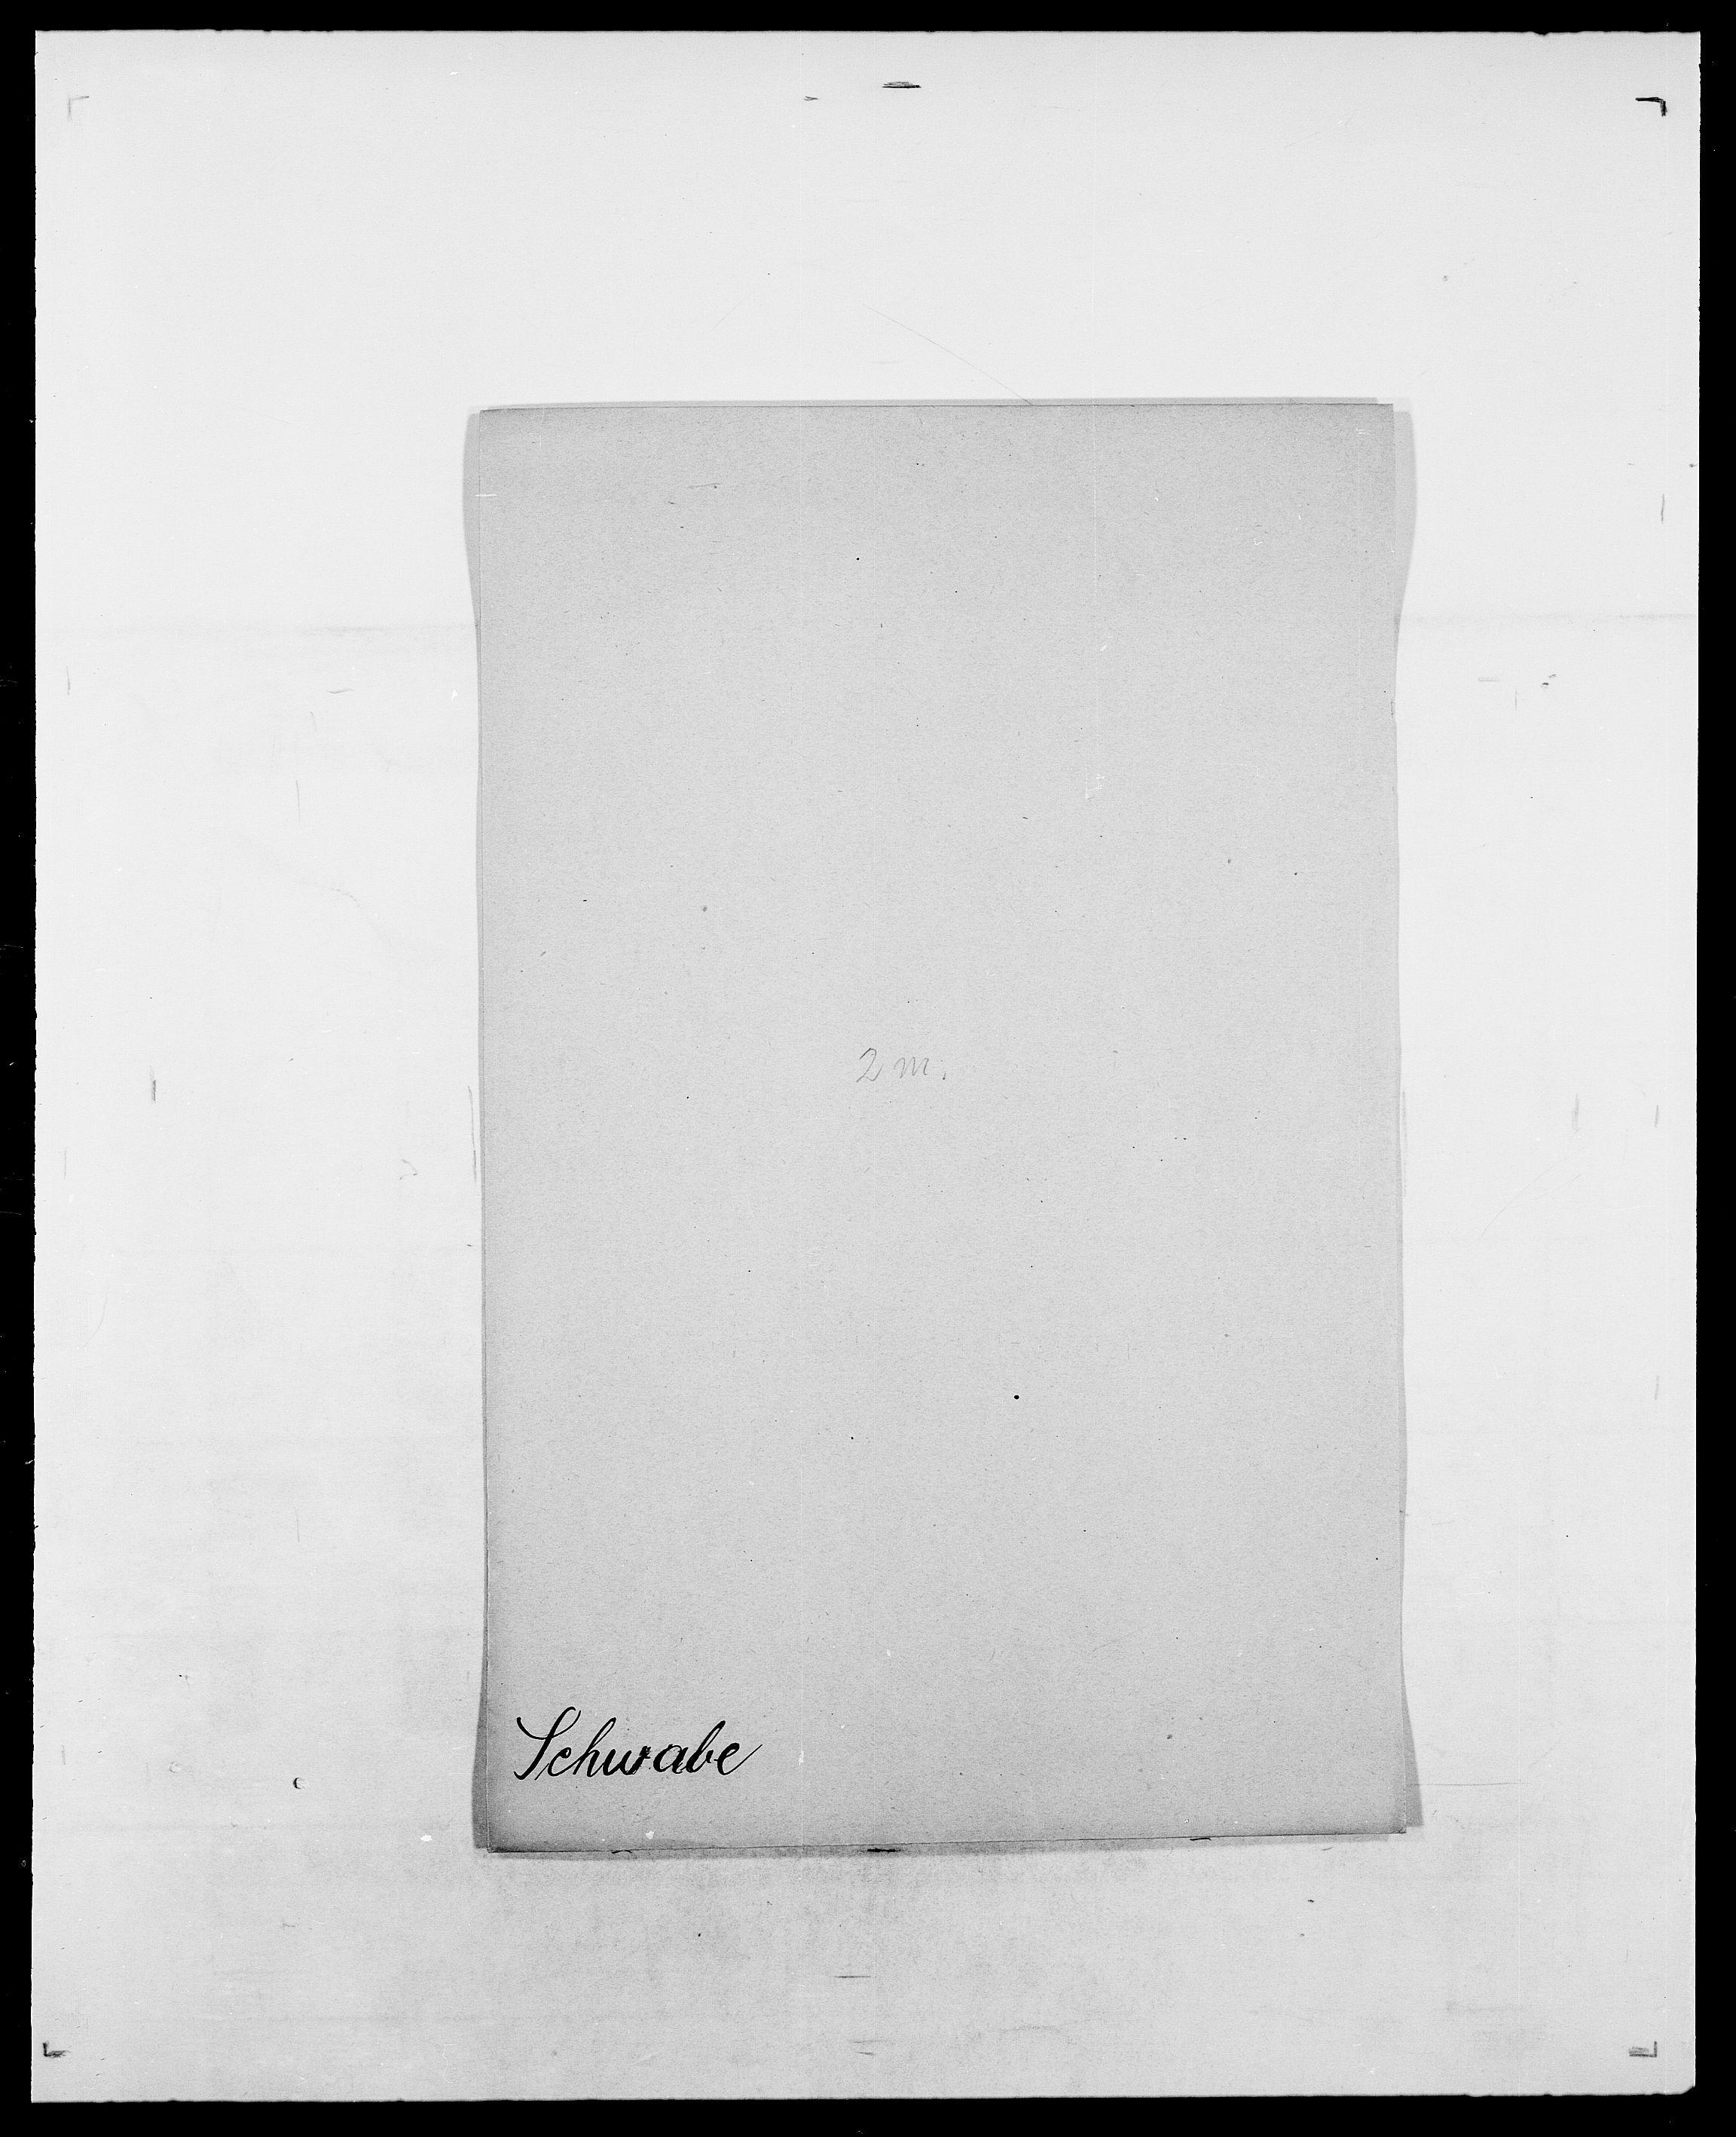 SAO, Delgobe, Charles Antoine - samling, D/Da/L0035: Schnabel - sjetman, s. 363